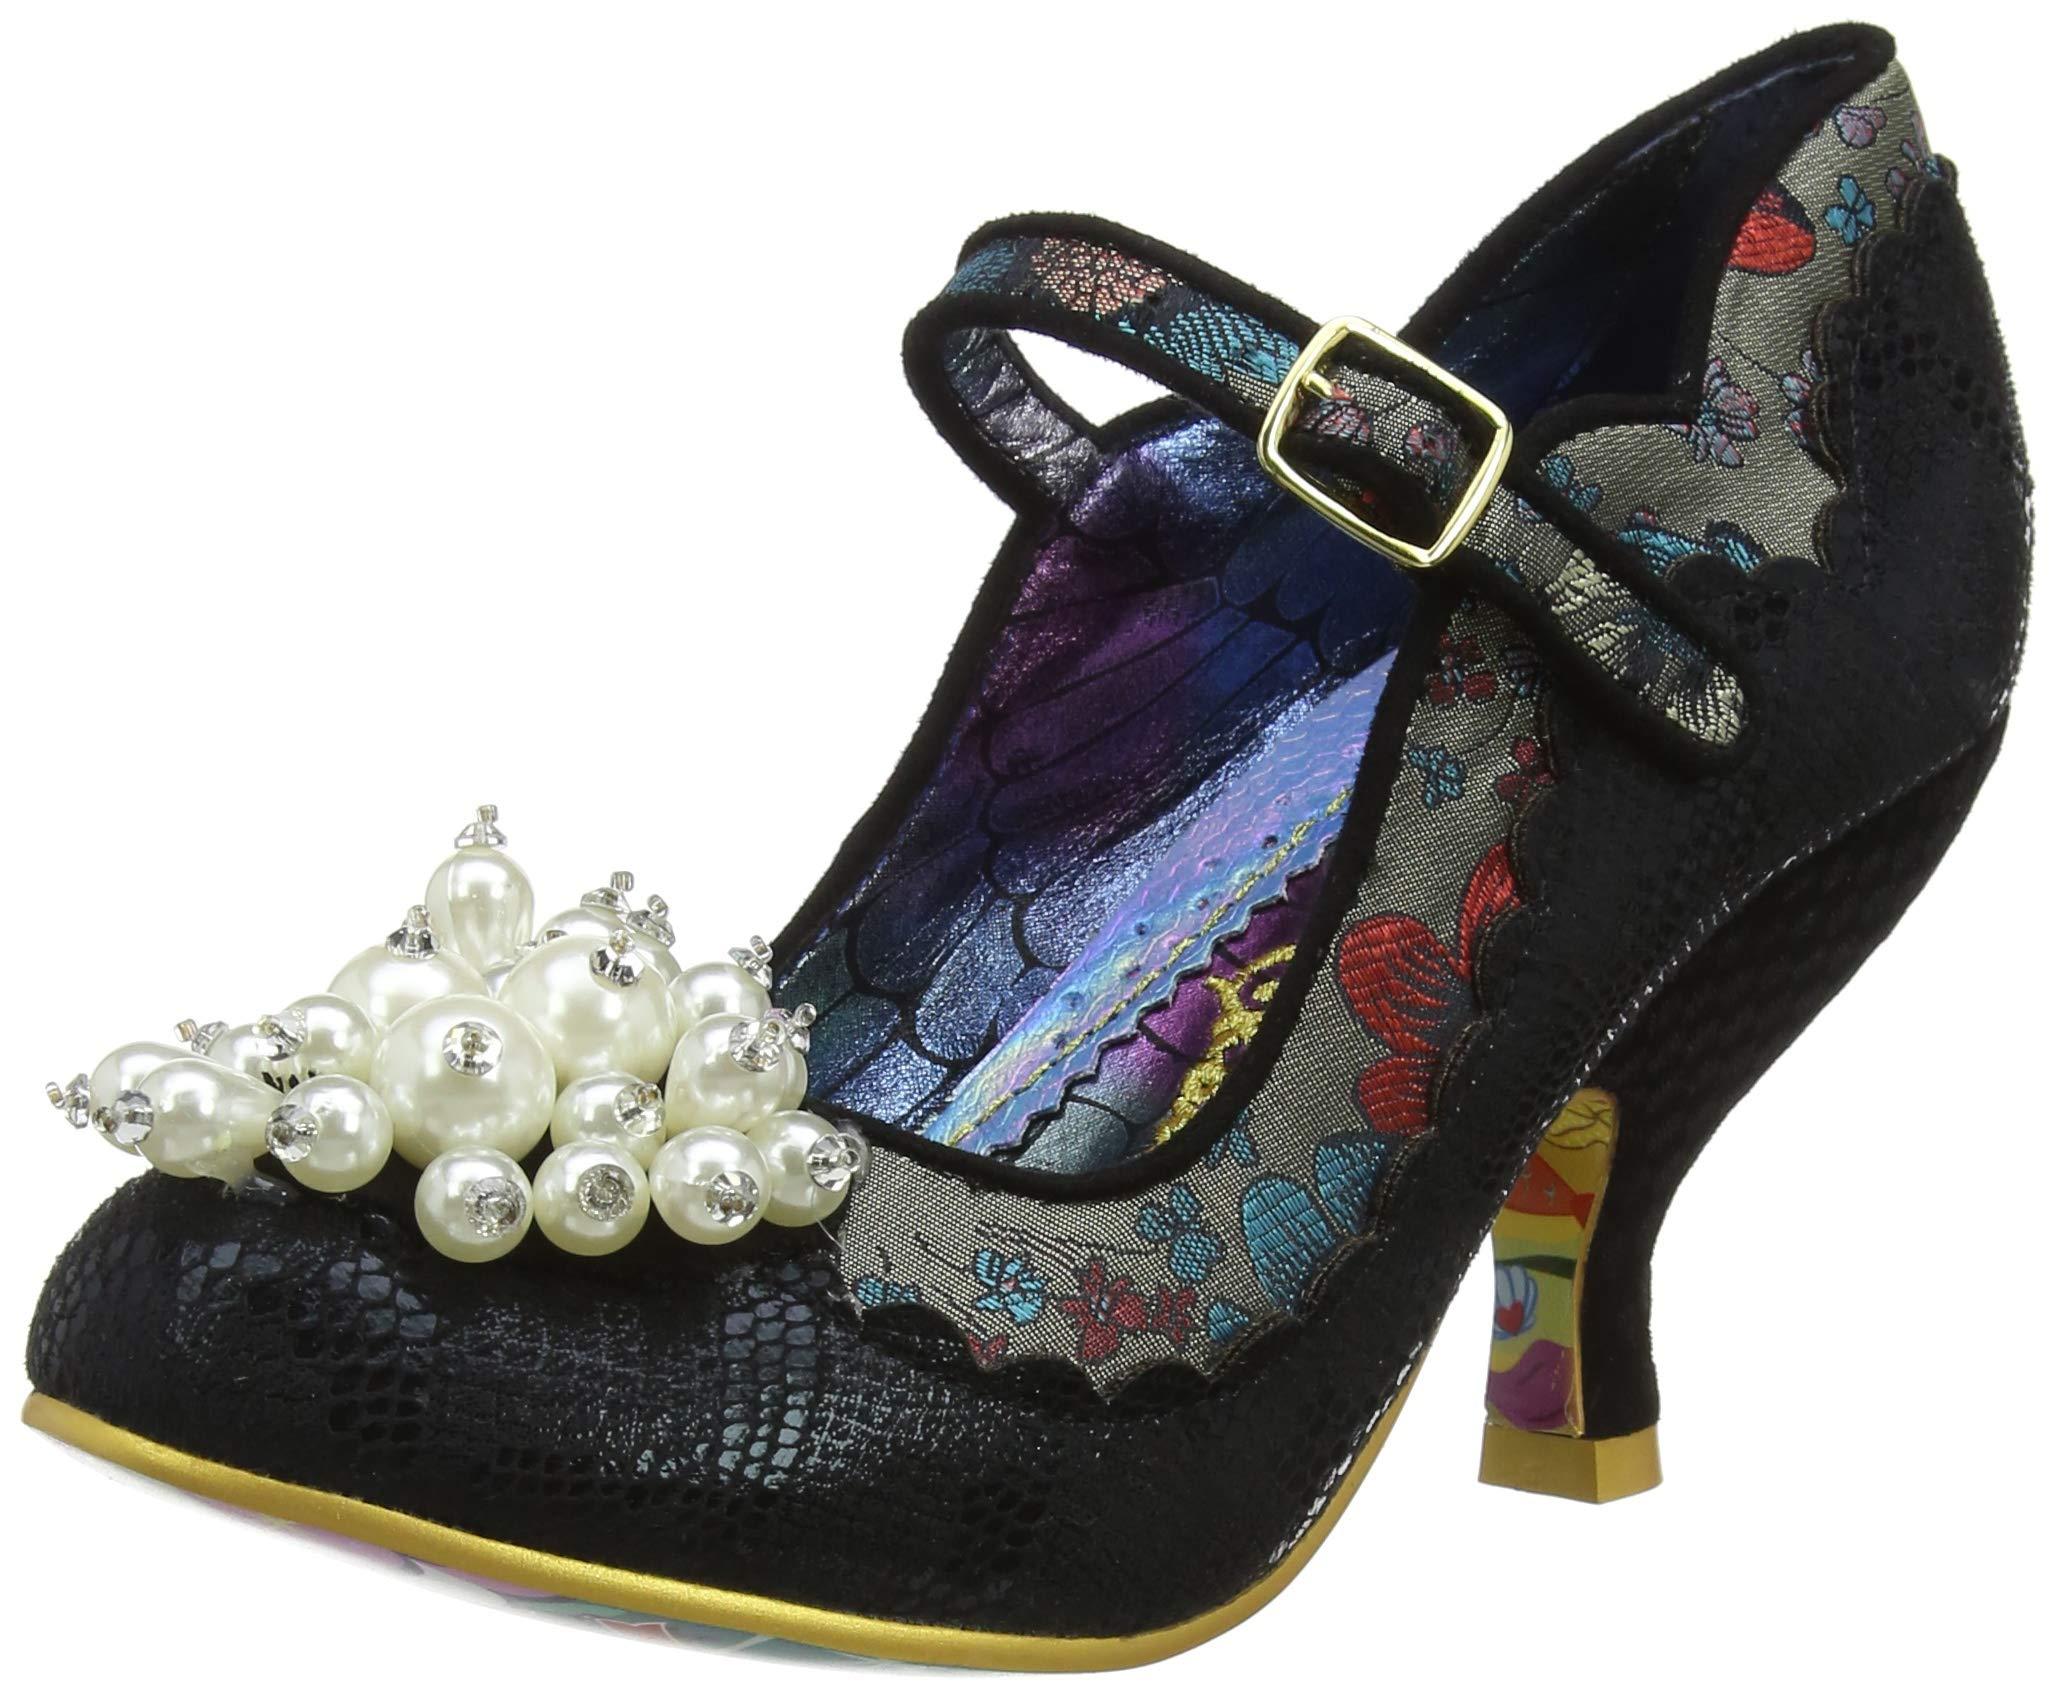 Janes Eu Choice FemmeNoirblack C39 ShoesburyMary Irregular thrdBoQxCs